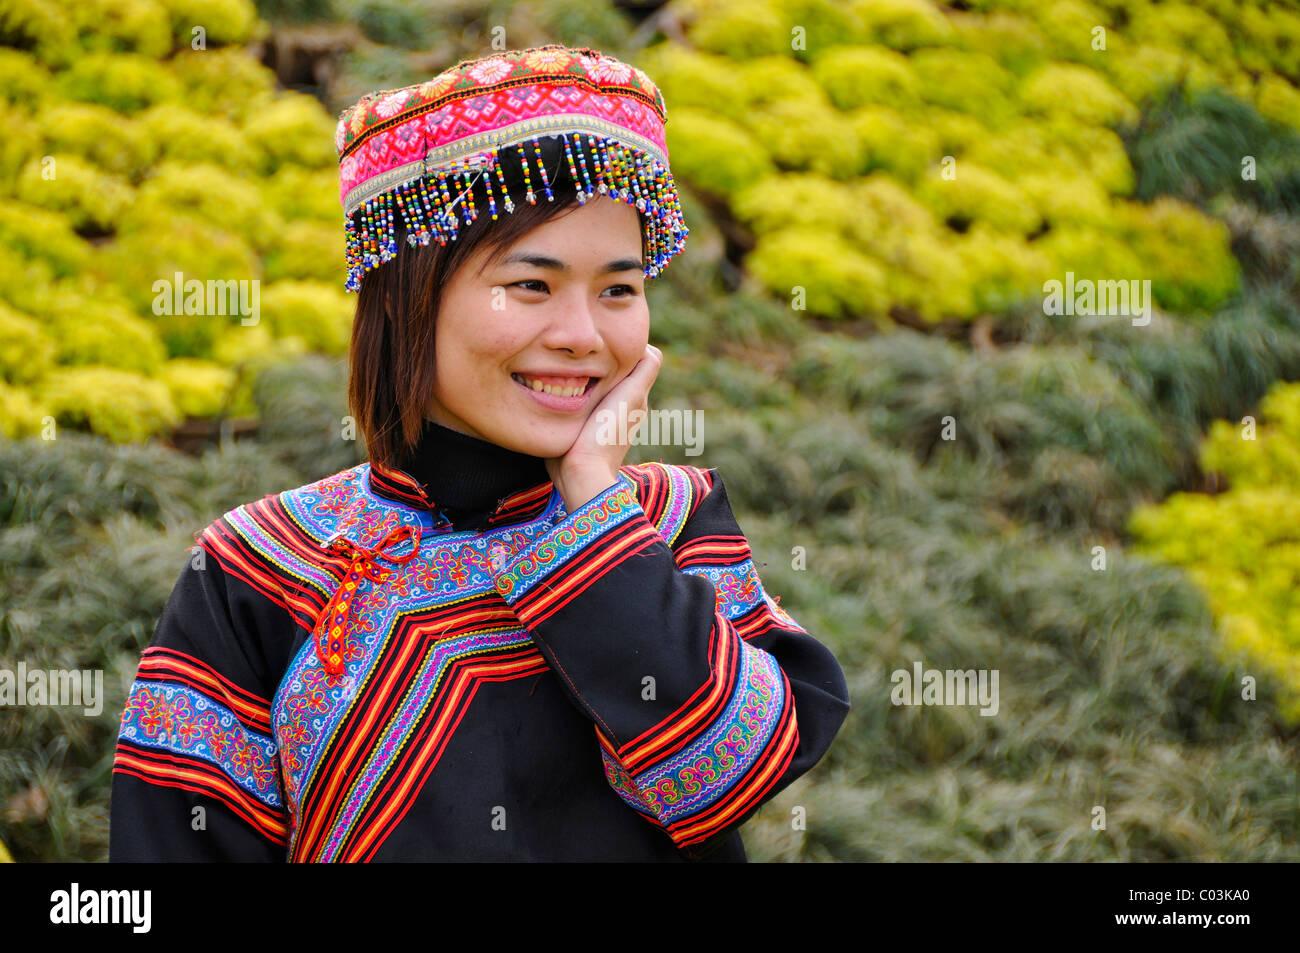 Turista vistiendo un traje tradicional, SAPA, Vietnam, Asia Imagen De Stock